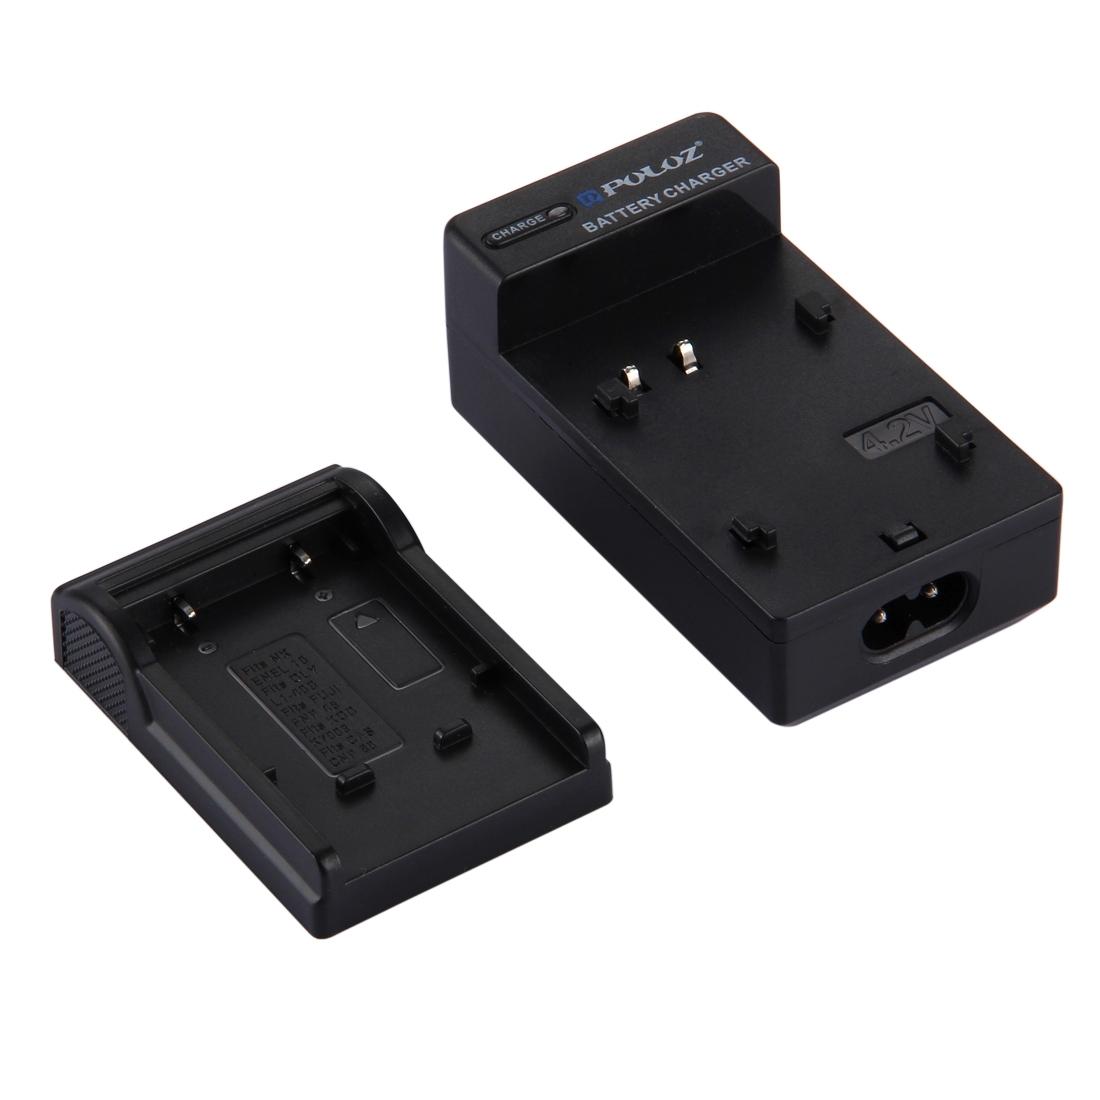 PULUZ EU Plug Battery Charger for Nikon EN-EL10, Olympus LI-40B, FUJI FNP-45, Kodak K7006, CASIO CNP80 Battery